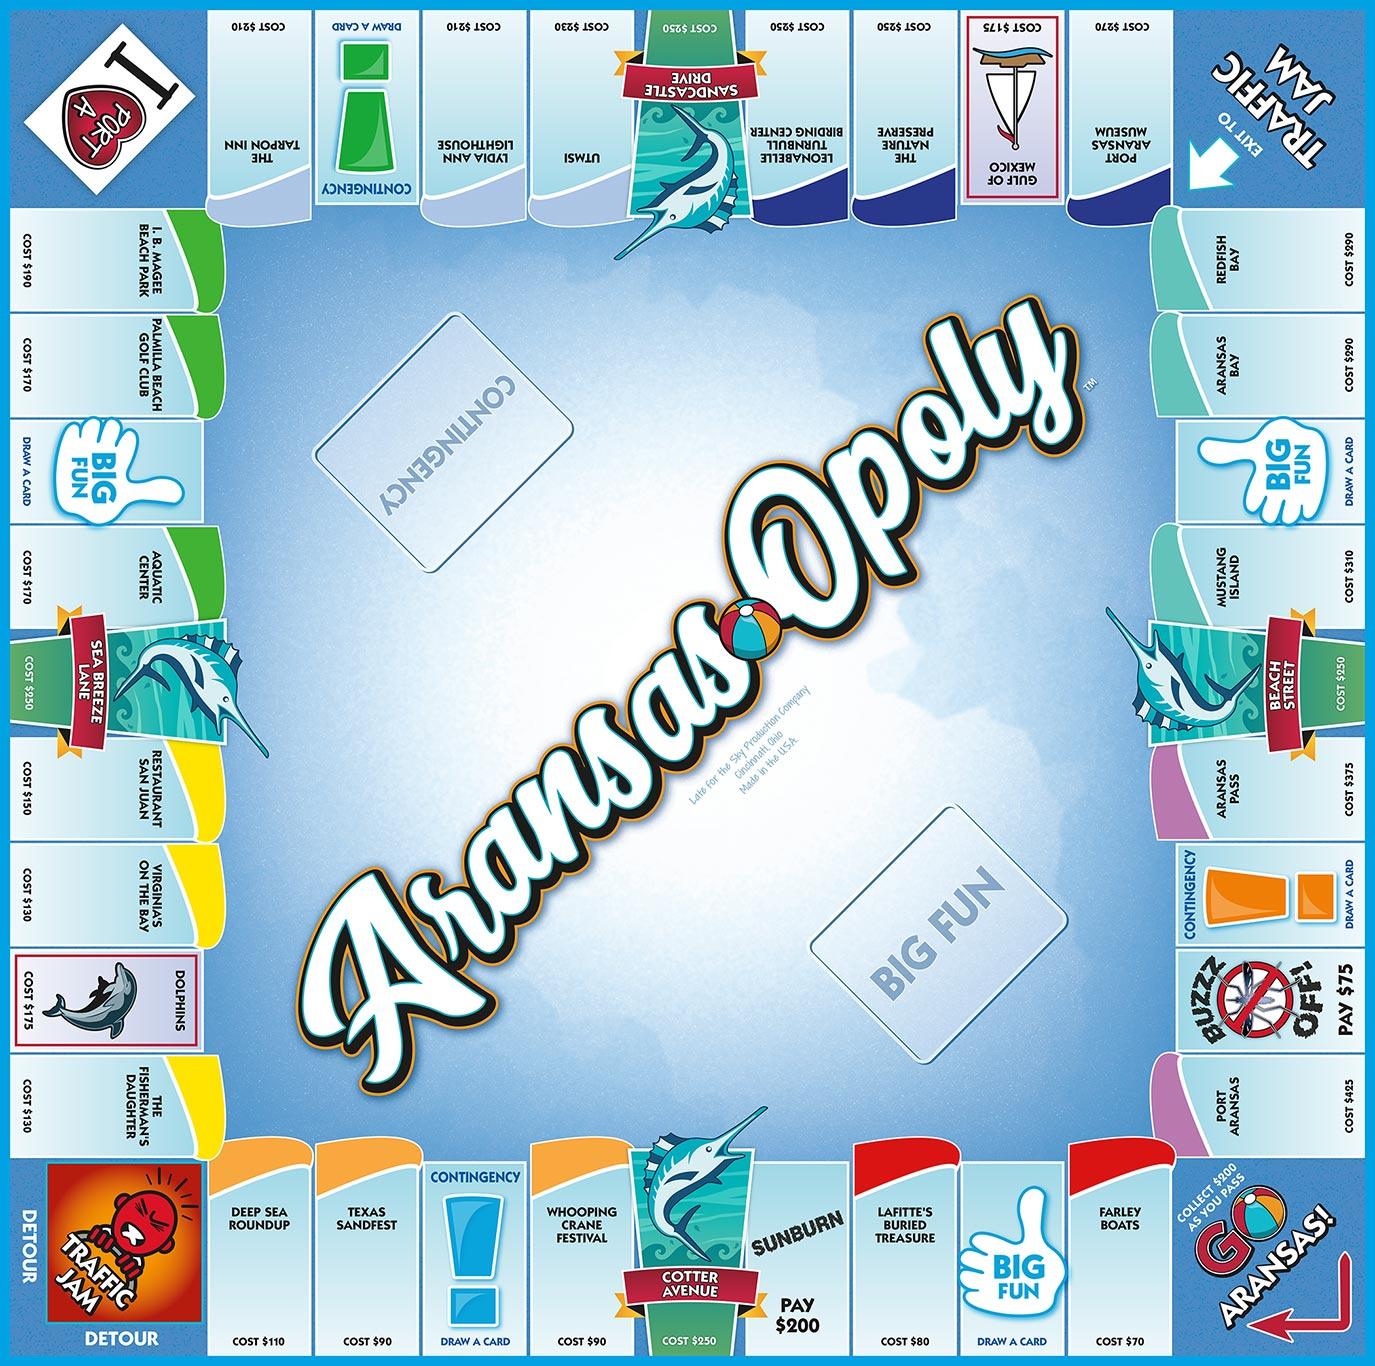 ARANSAS-OPOLY Board Game